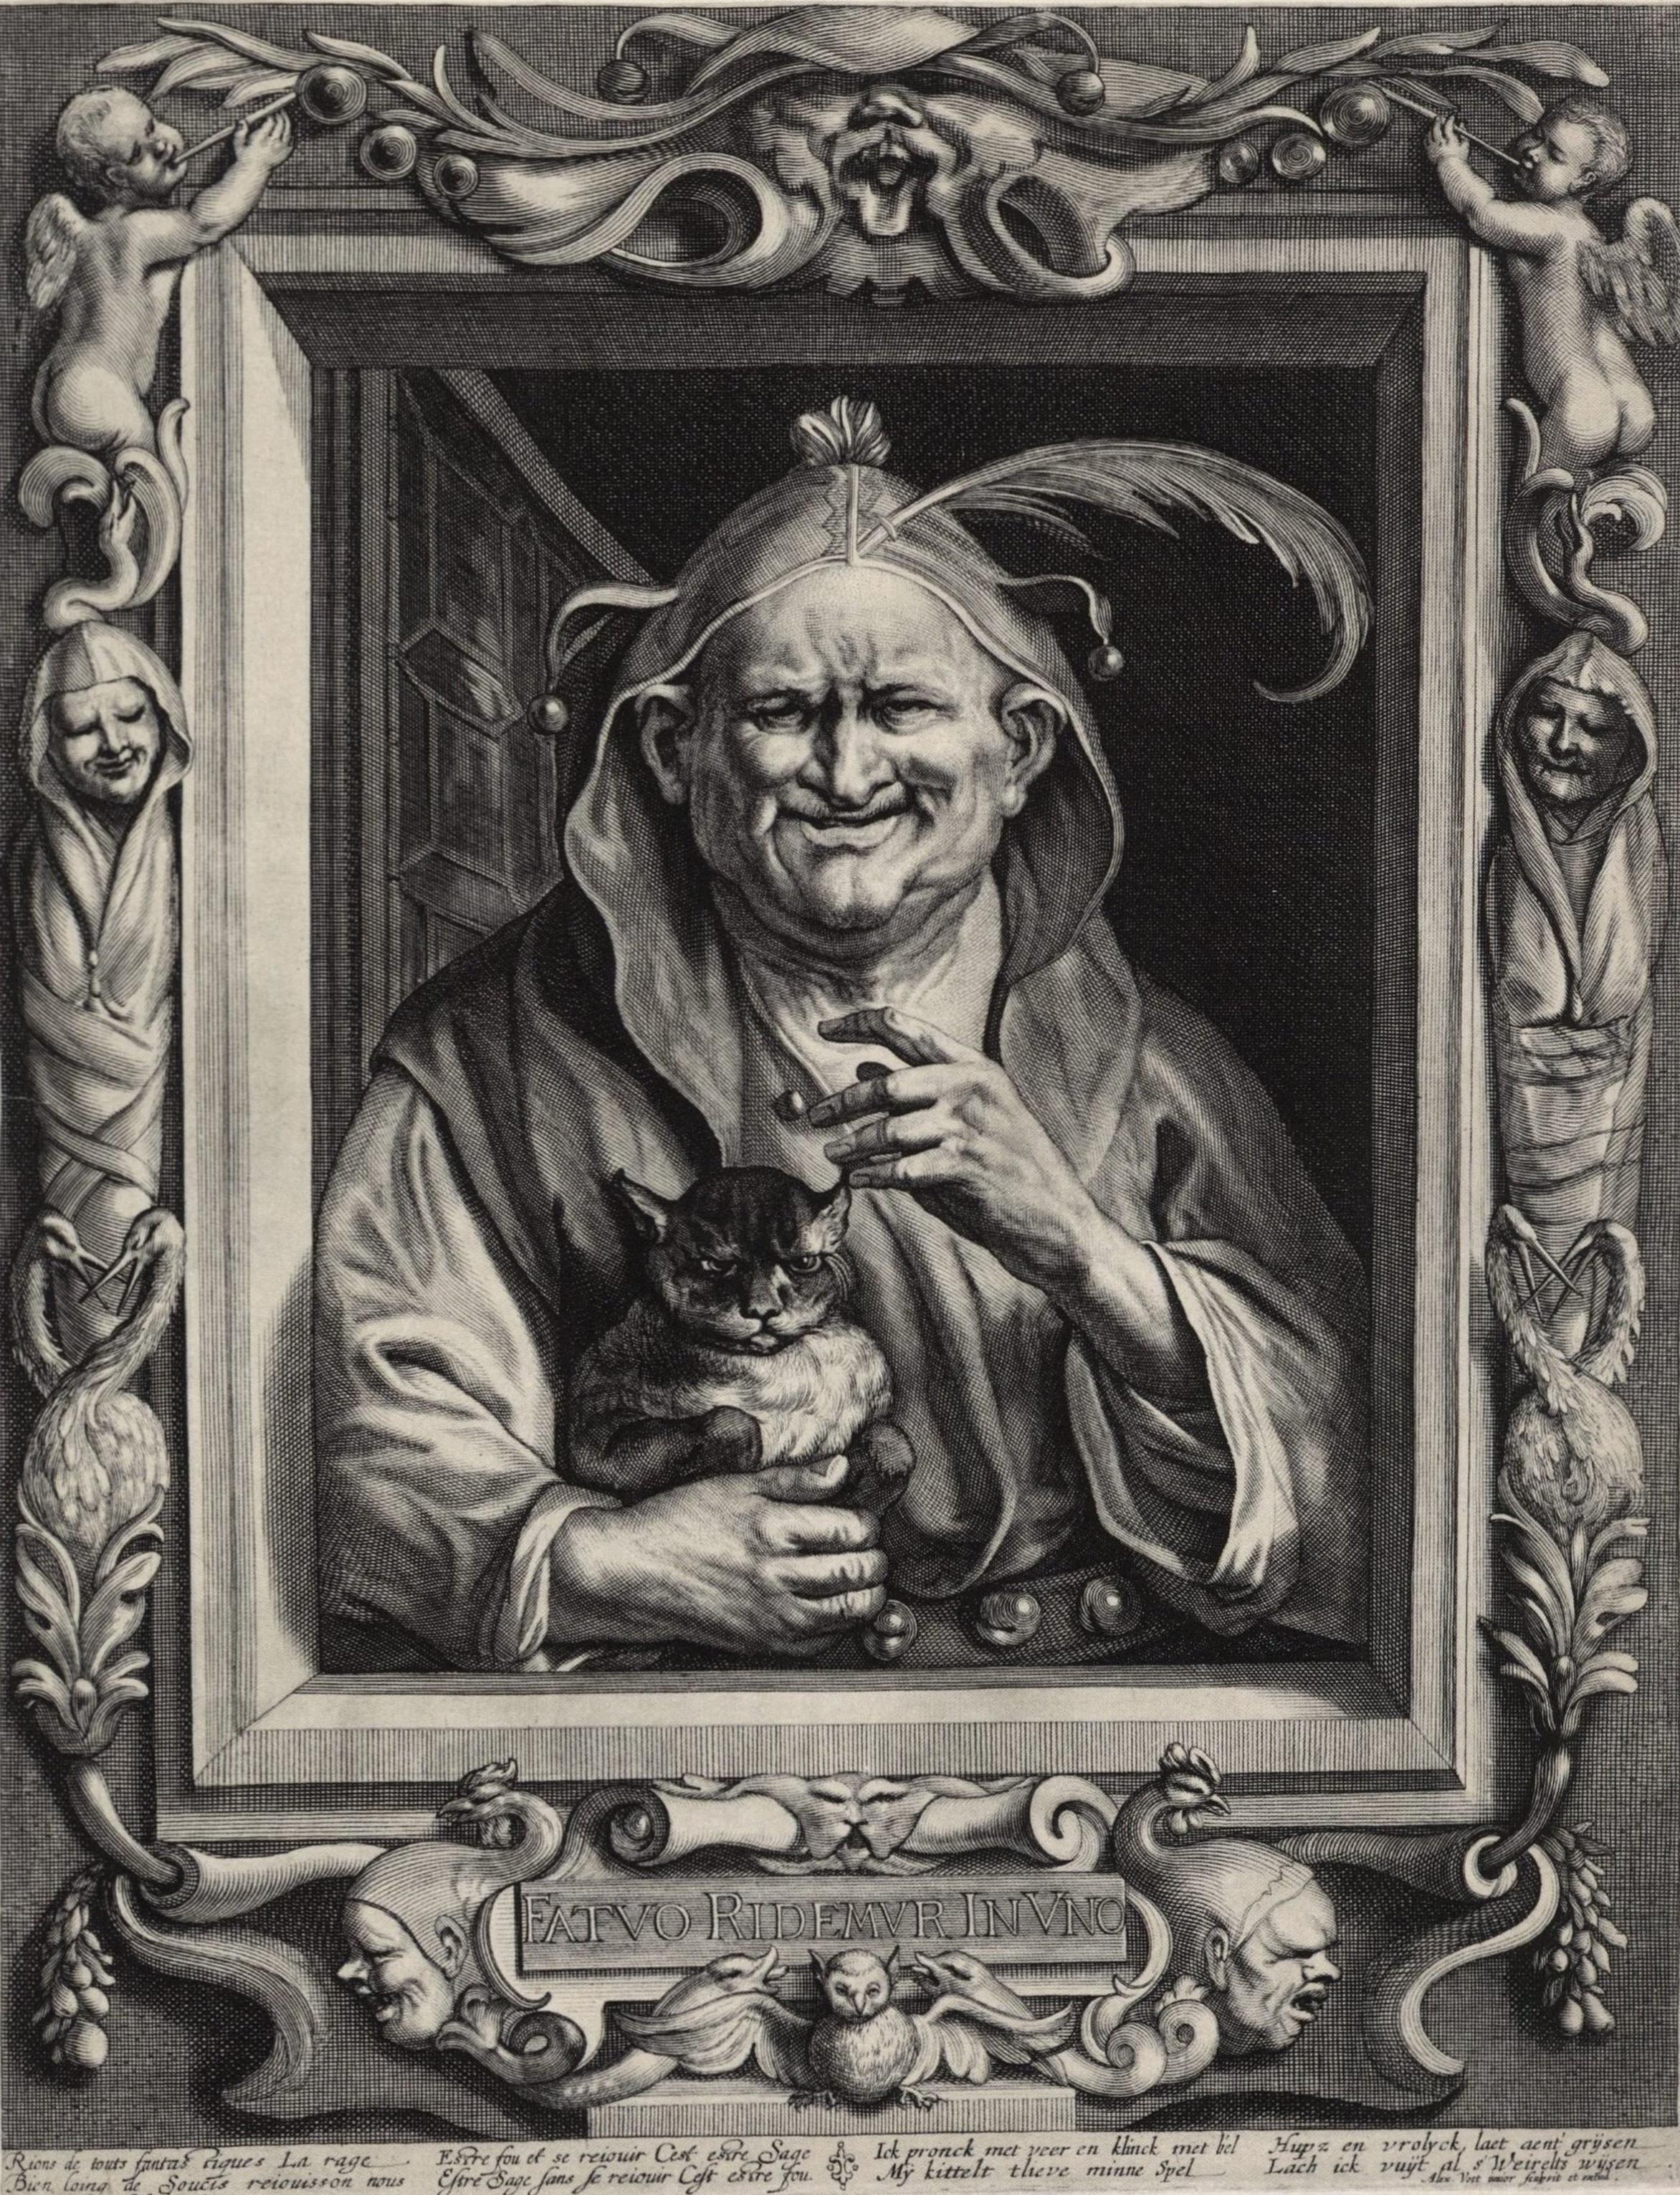 Alexander Voet after Jacob Jordaens, Fatuo Ridermur in Uno, engraved.